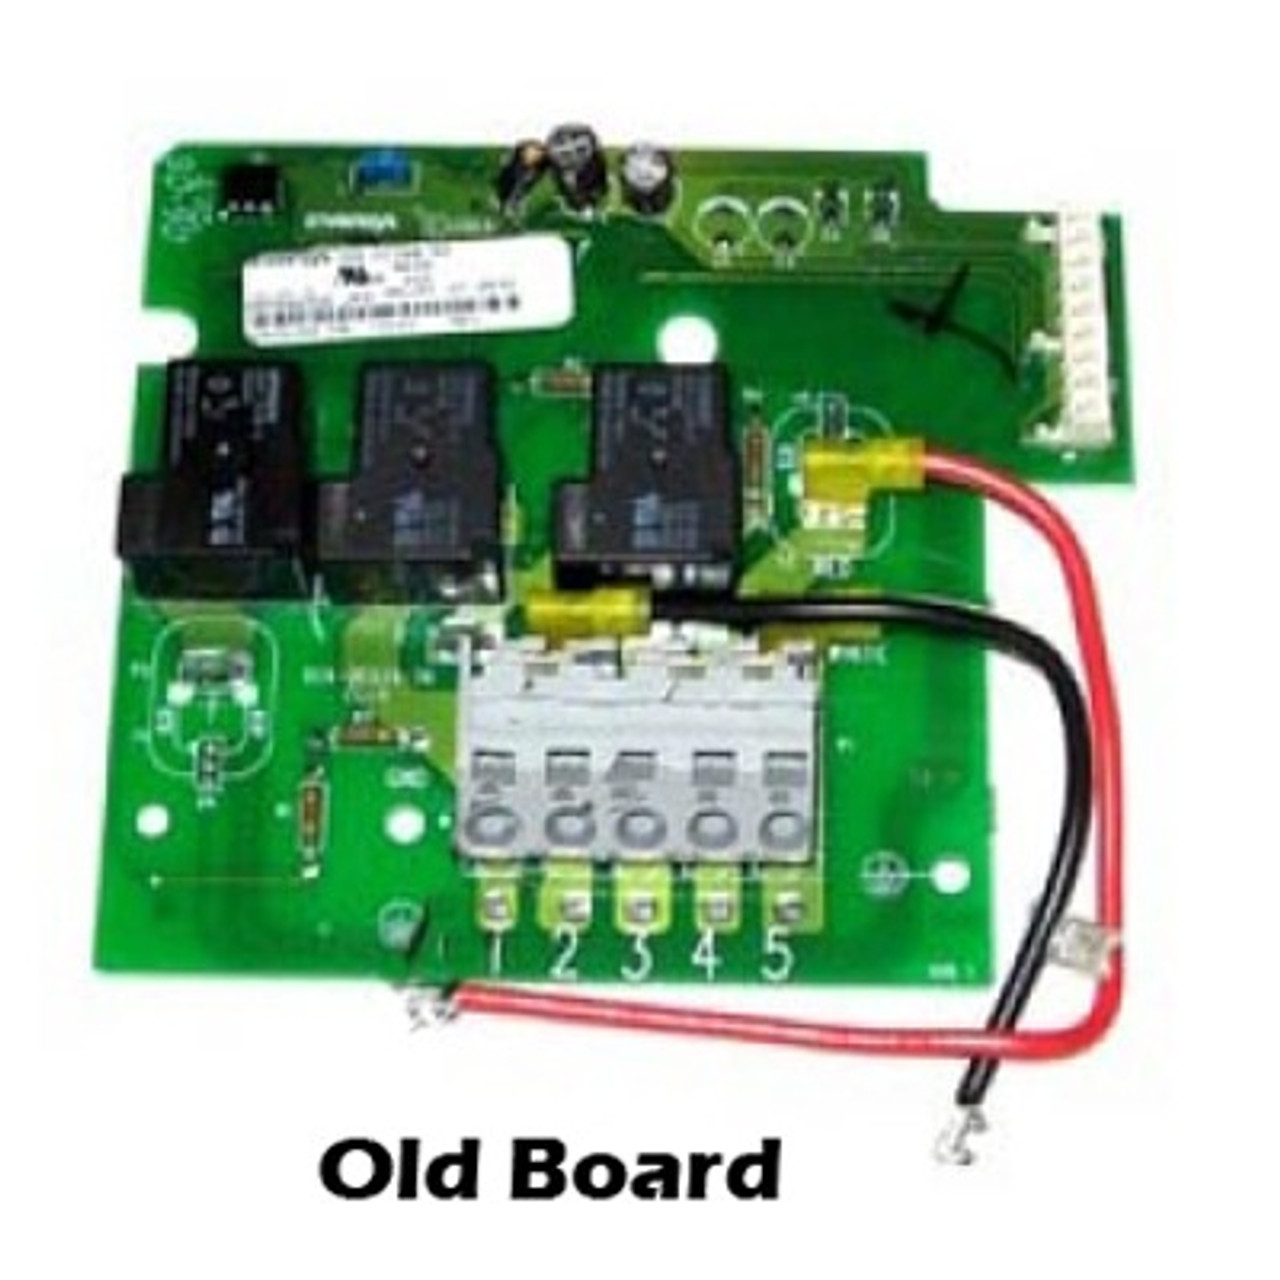 hight resolution of  wiring diagram on caldera spas hot spring tiger river watkins iq 2020 heater relay on